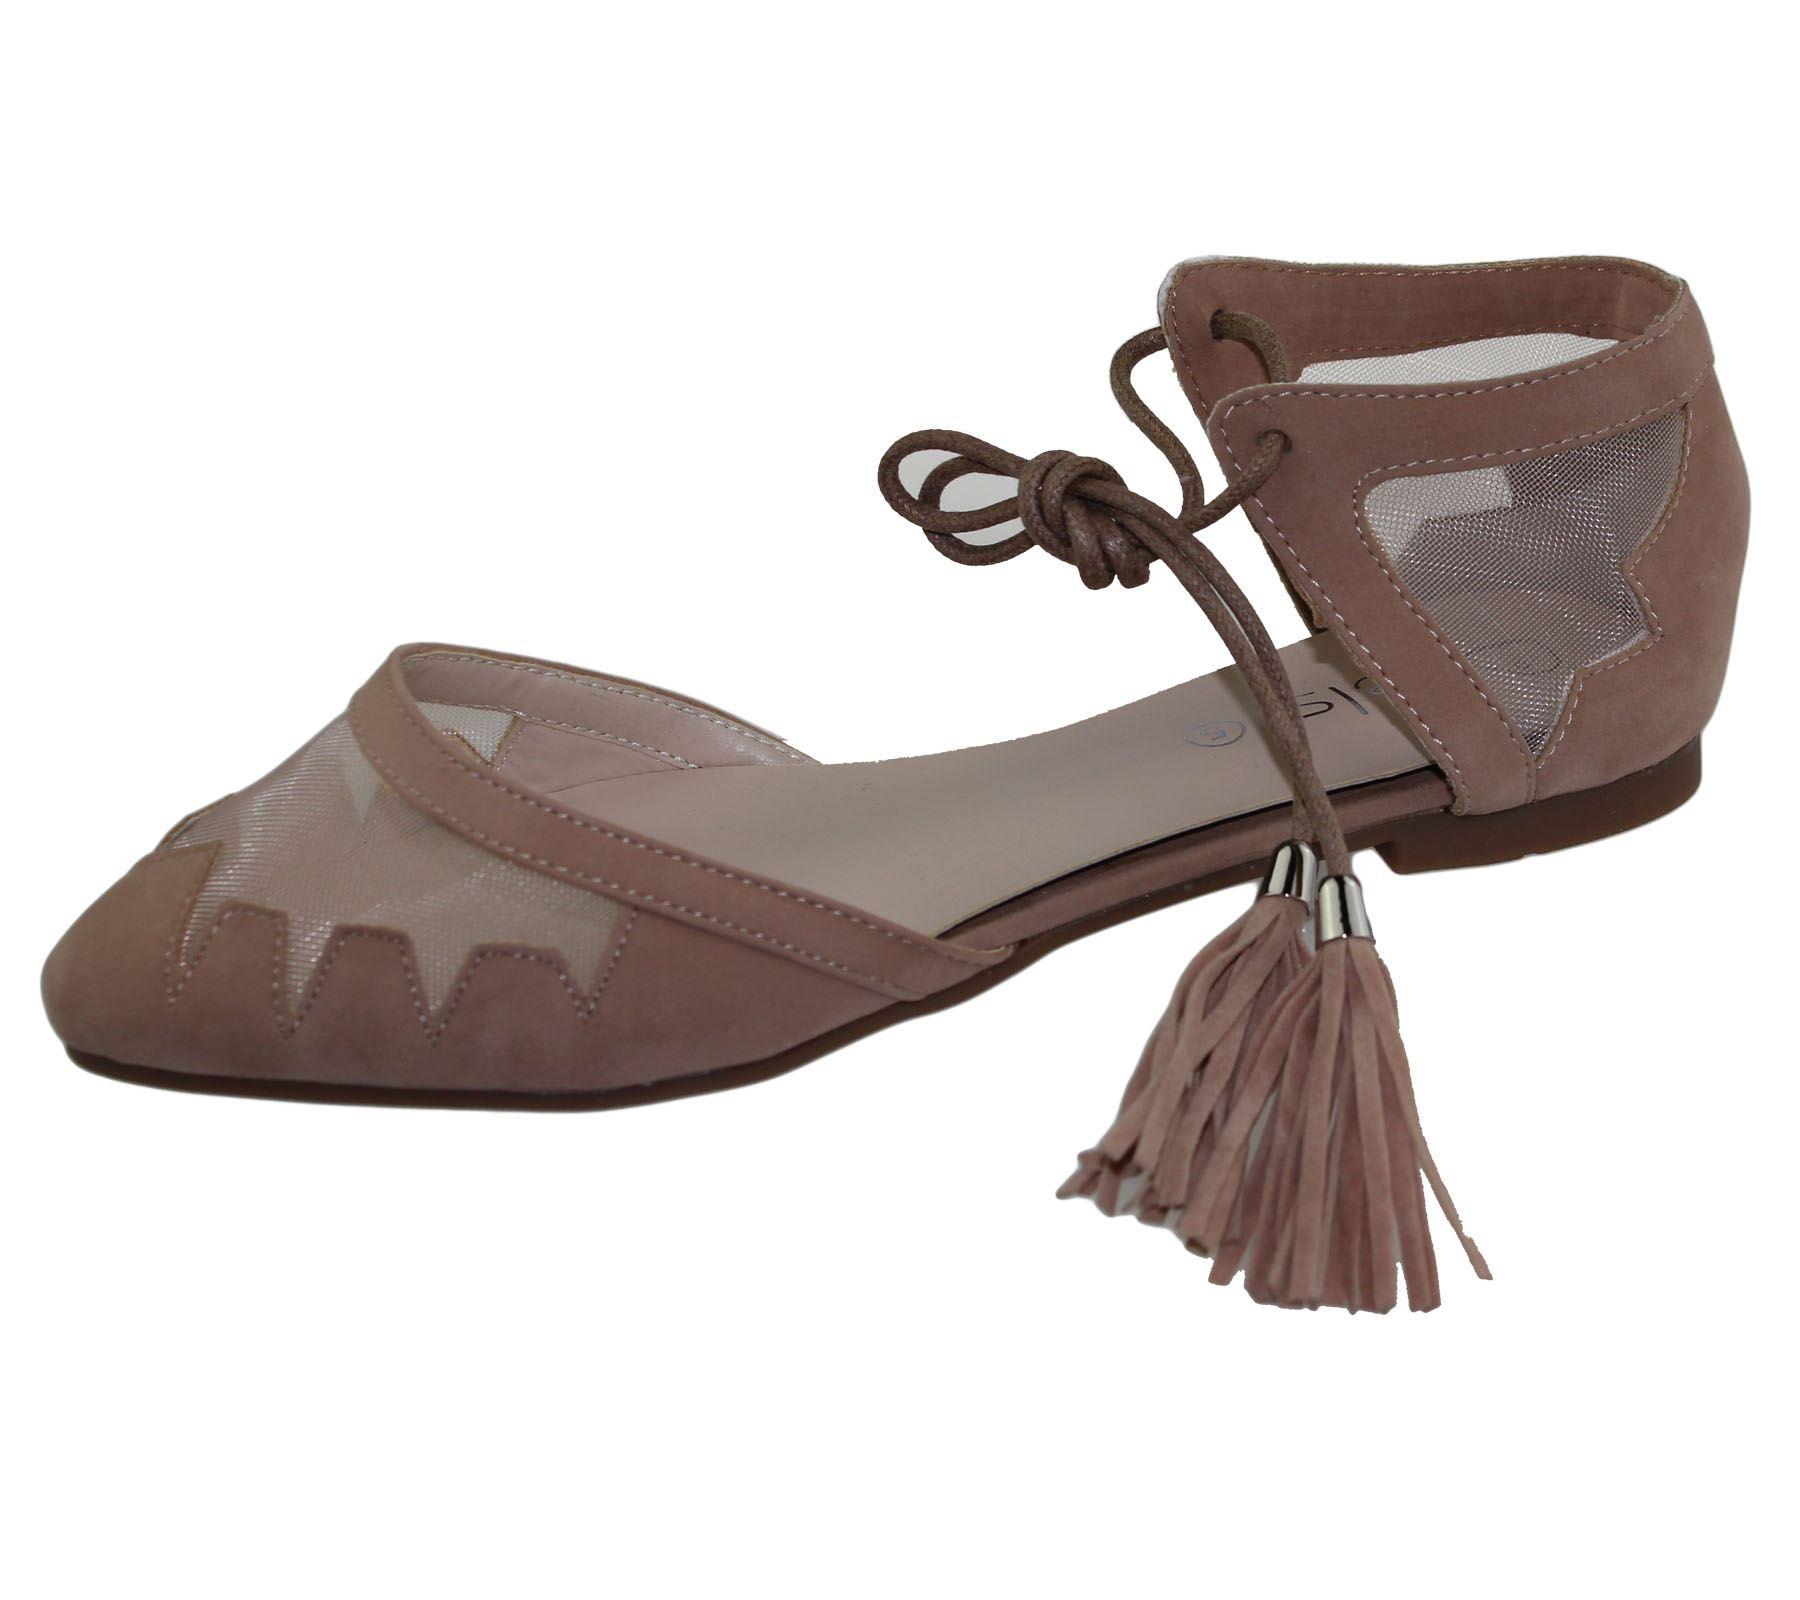 Womens-Flat-Ballerina-Dolly-Pumps-Ballet-Ladies-Summer-Mesh-Tassel-Shoes-Sandals thumbnail 27